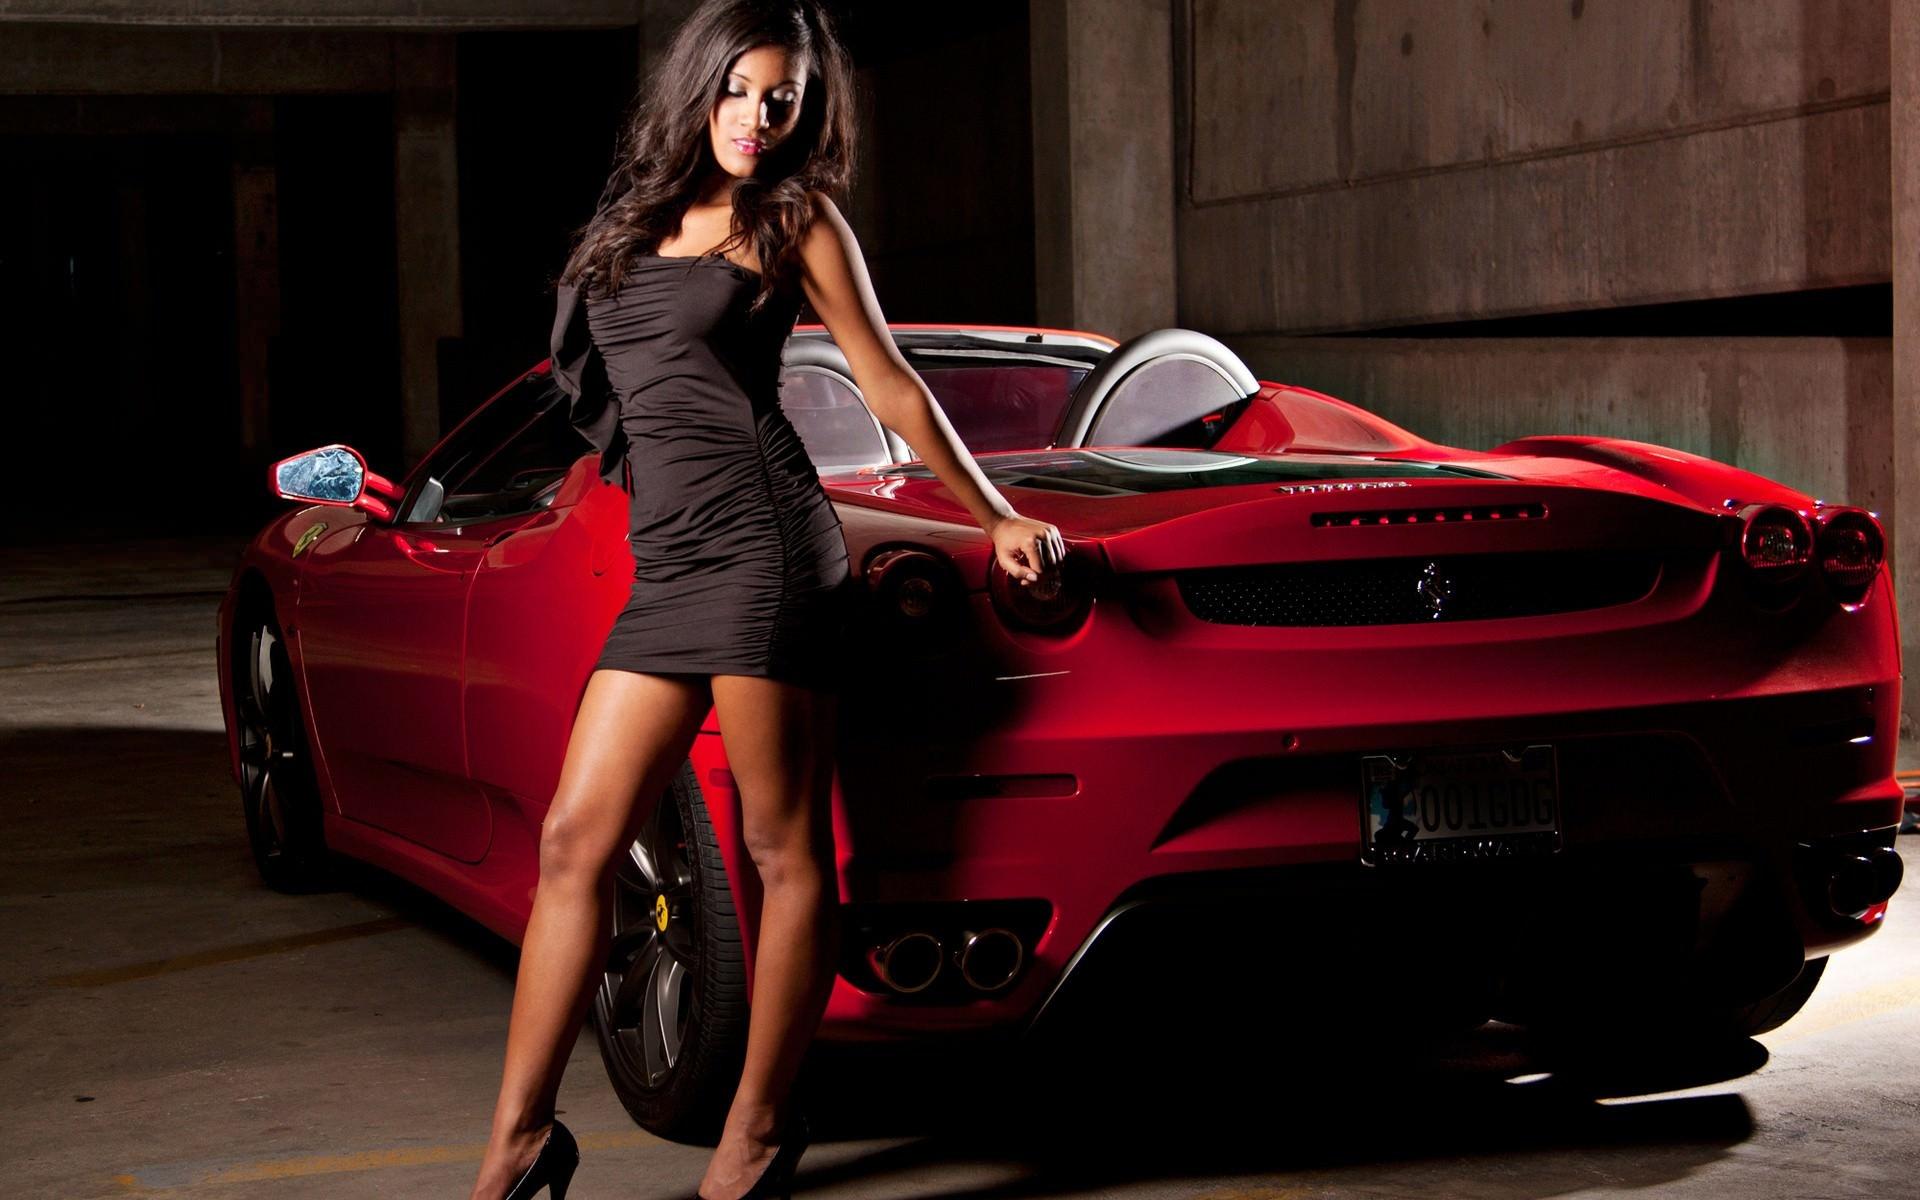 Sexy Ferrari Girl